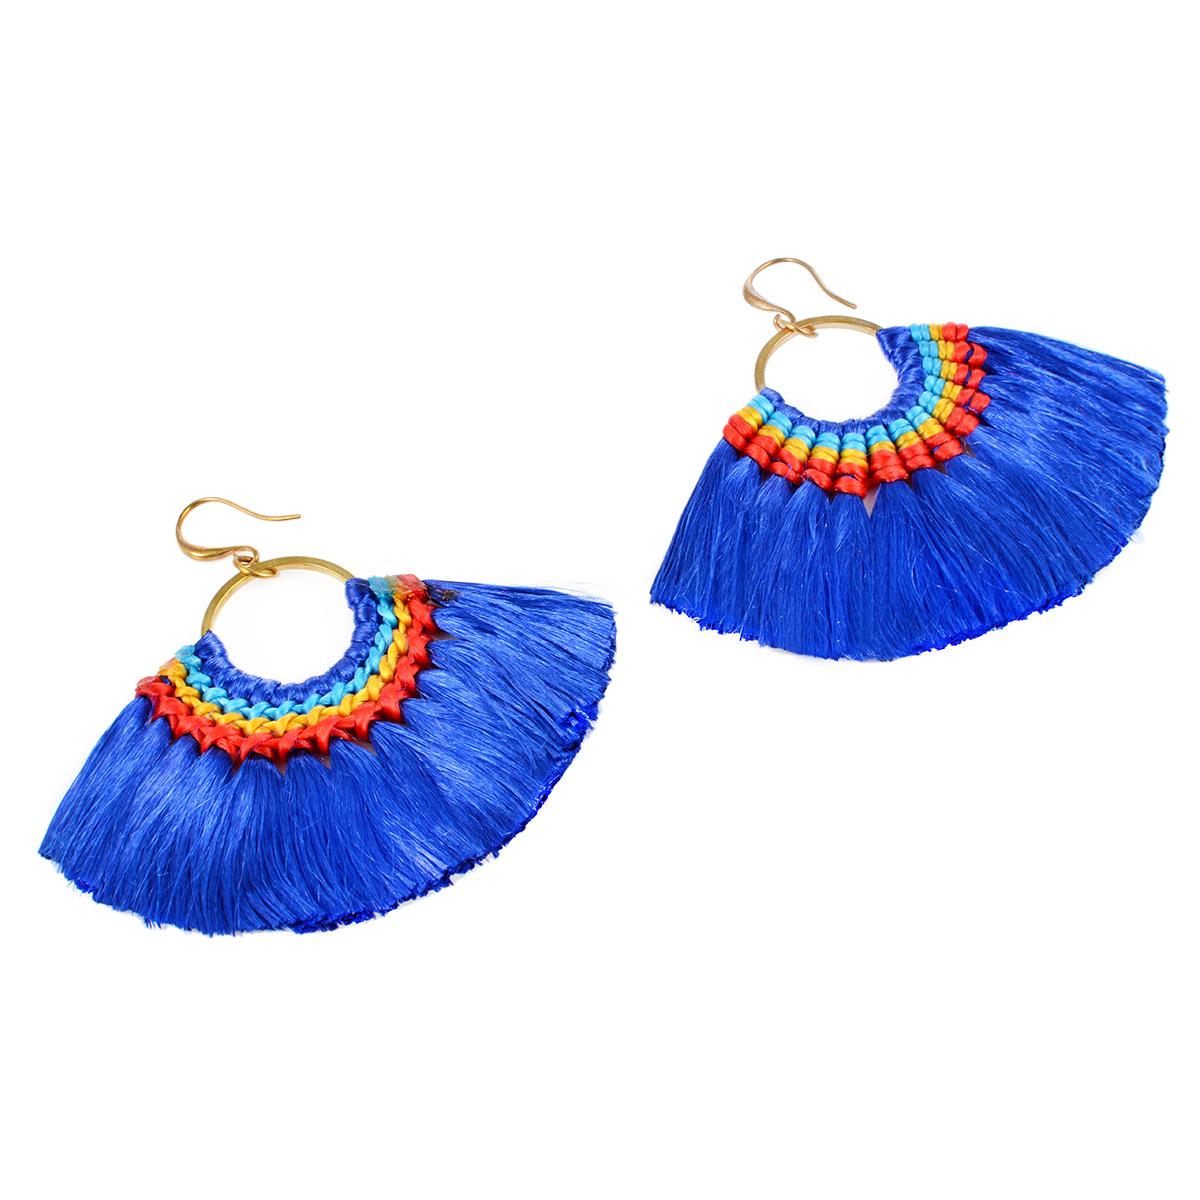 folk-custom metal plating earring (B0697 color)NHXR1445-B0697 color